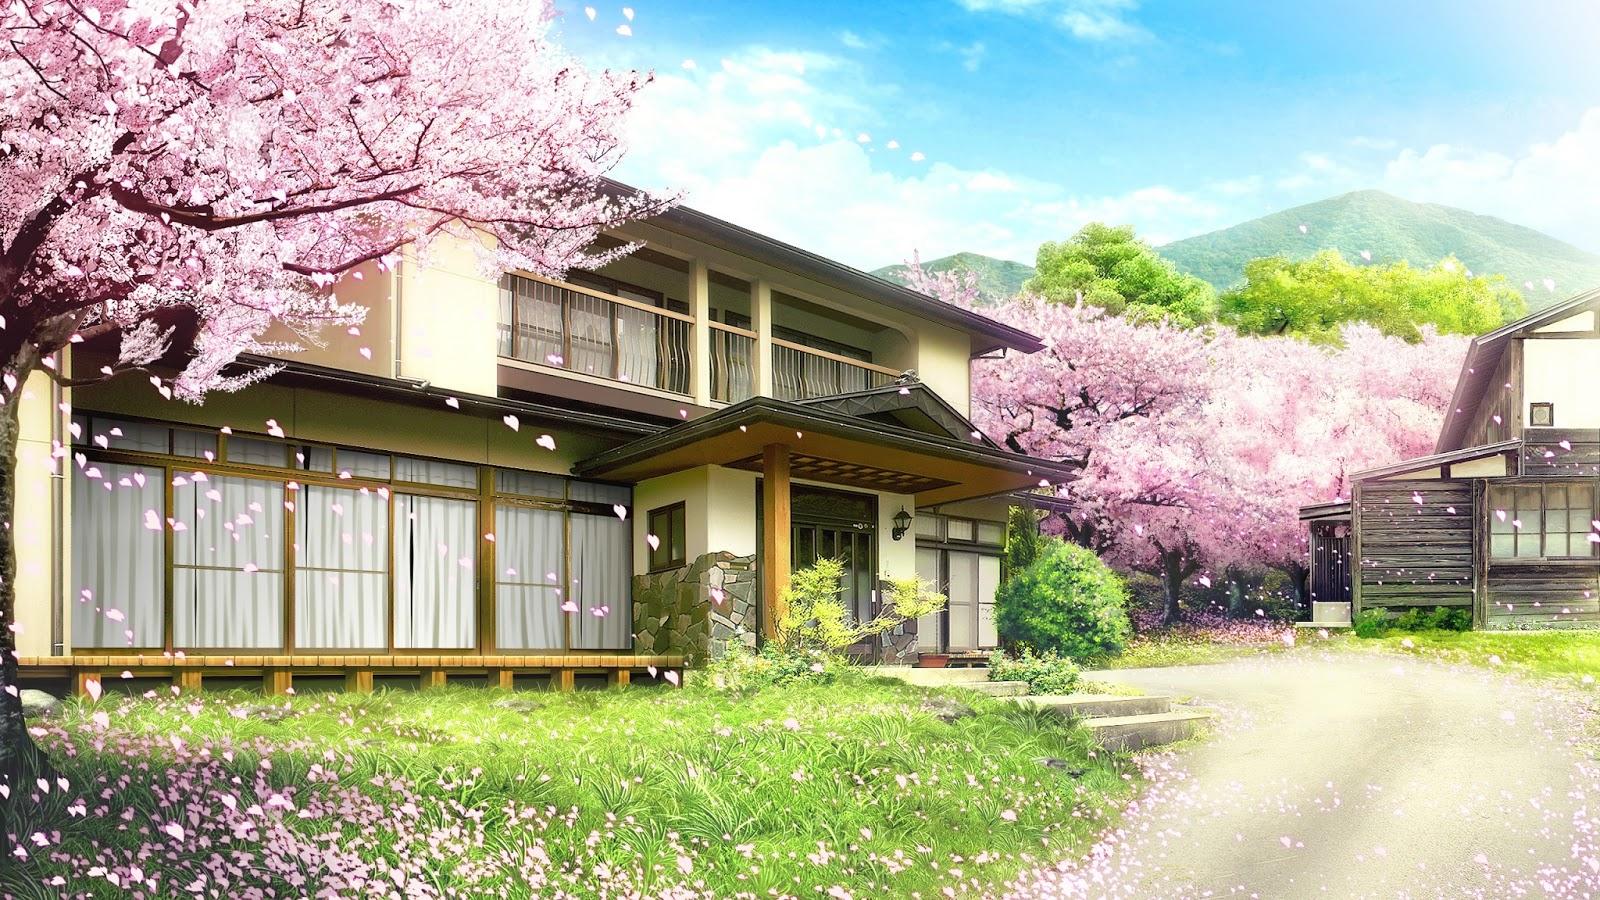 House Anime Background